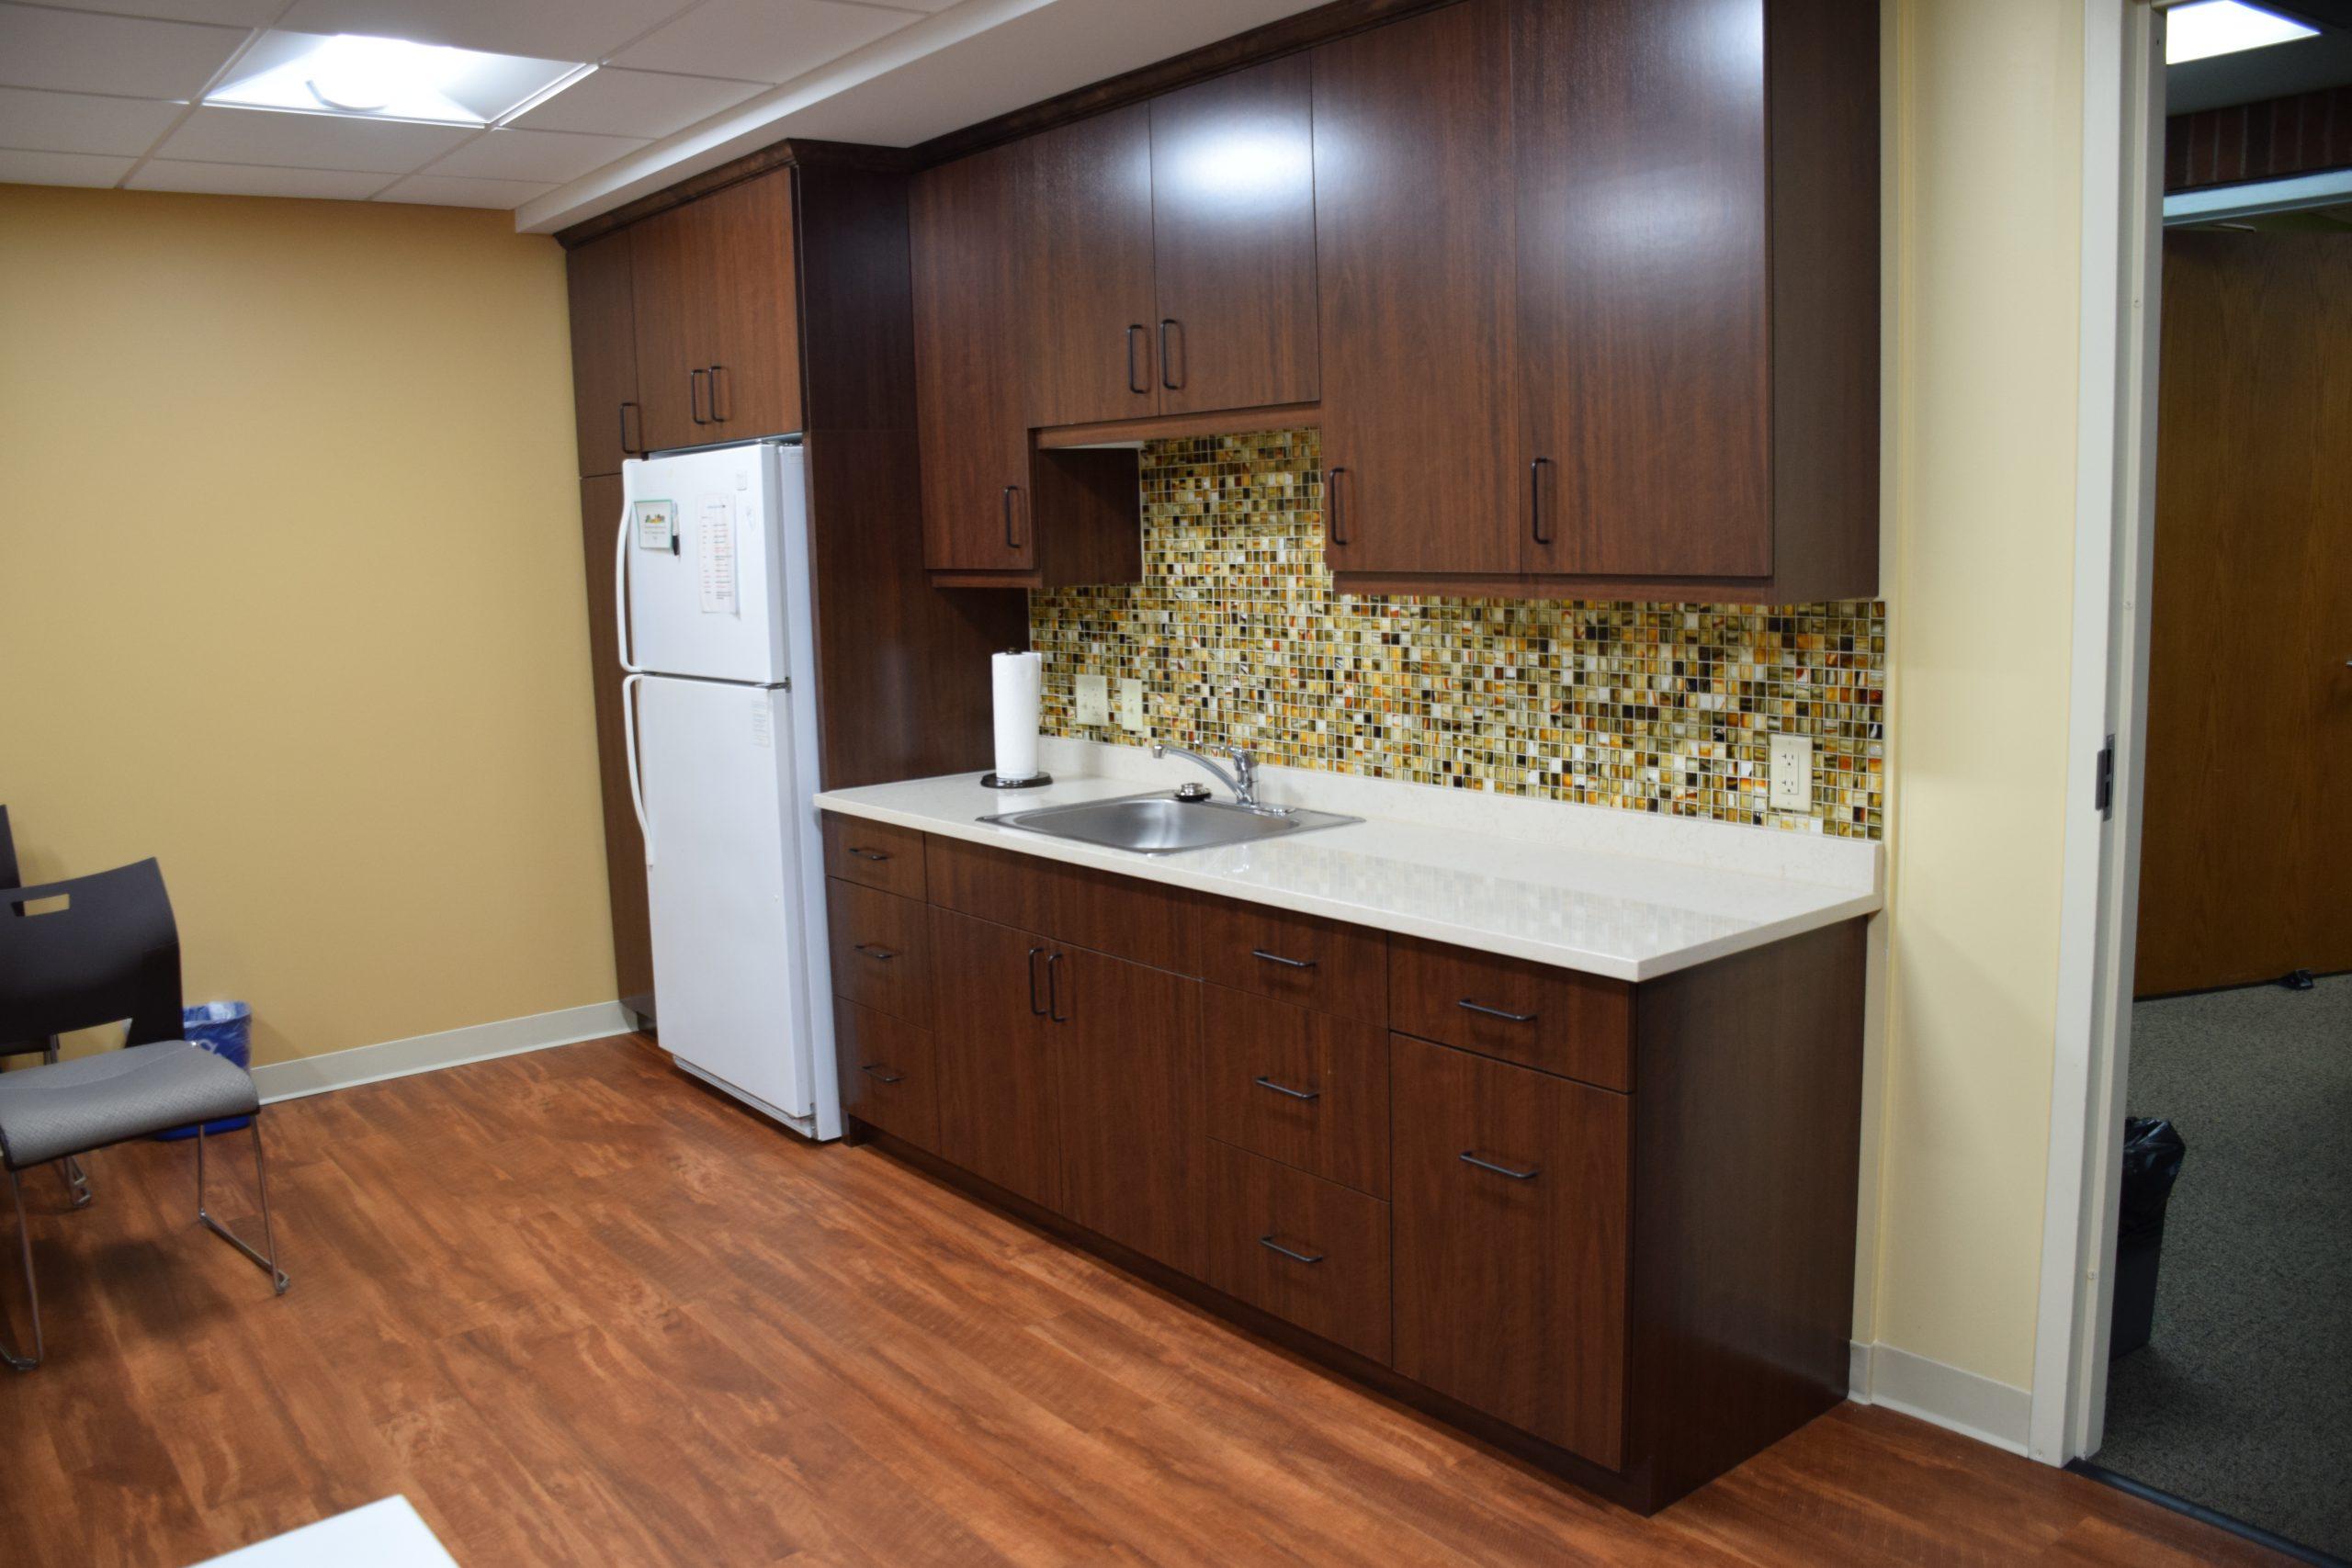 Pediatric kitchen area including custom cabinetry, refrigerator, sink, and colorful tile backsplash